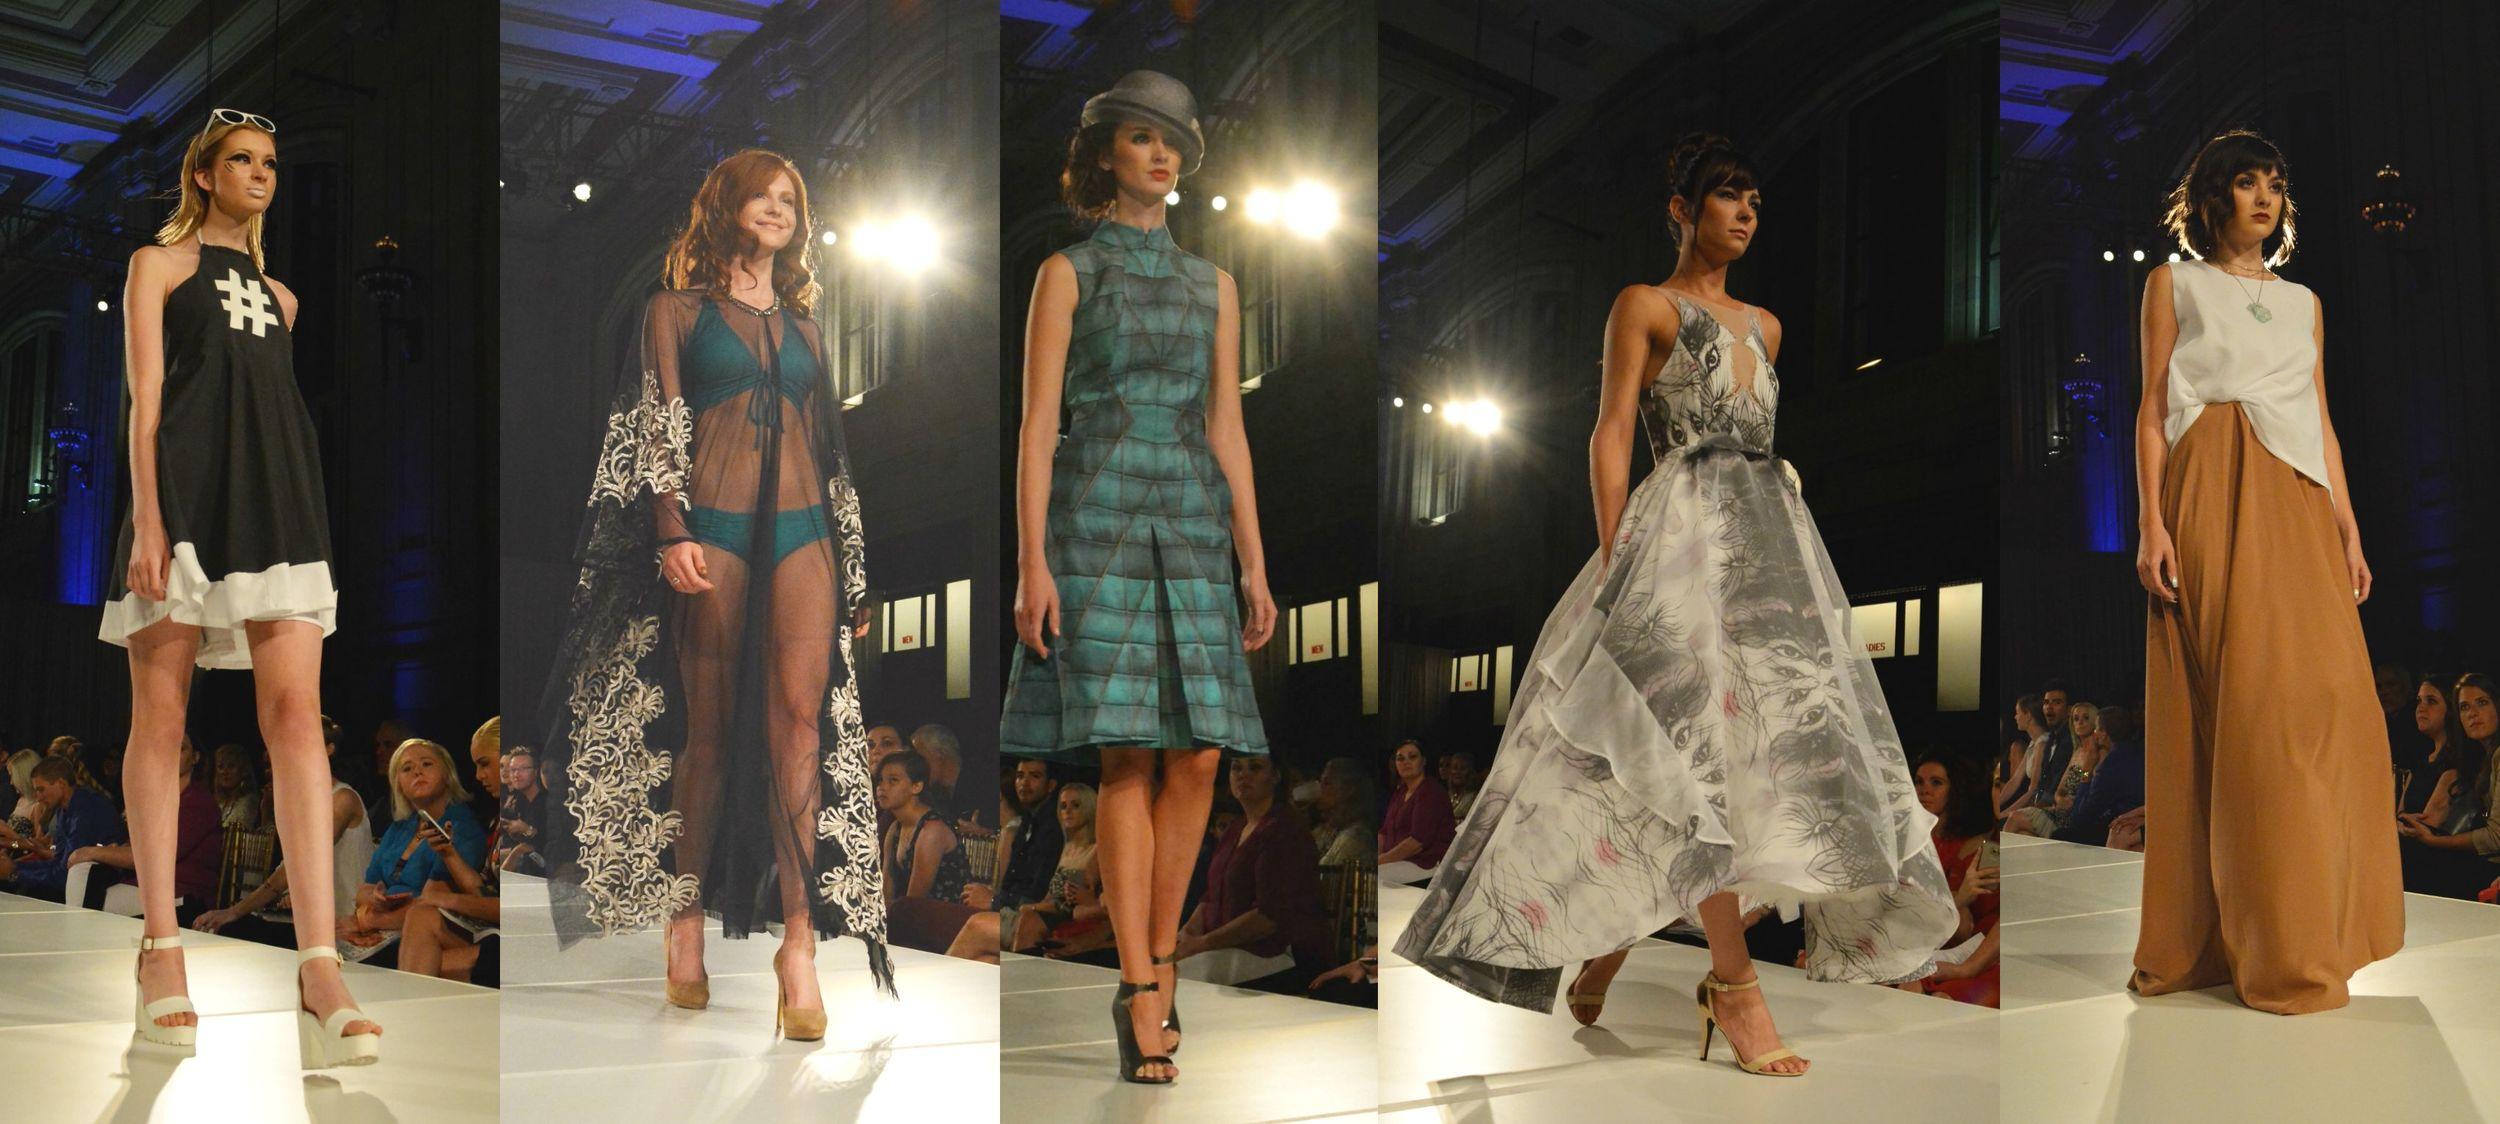 Kansas City Fashion Week favorites on Sophisticaited.com